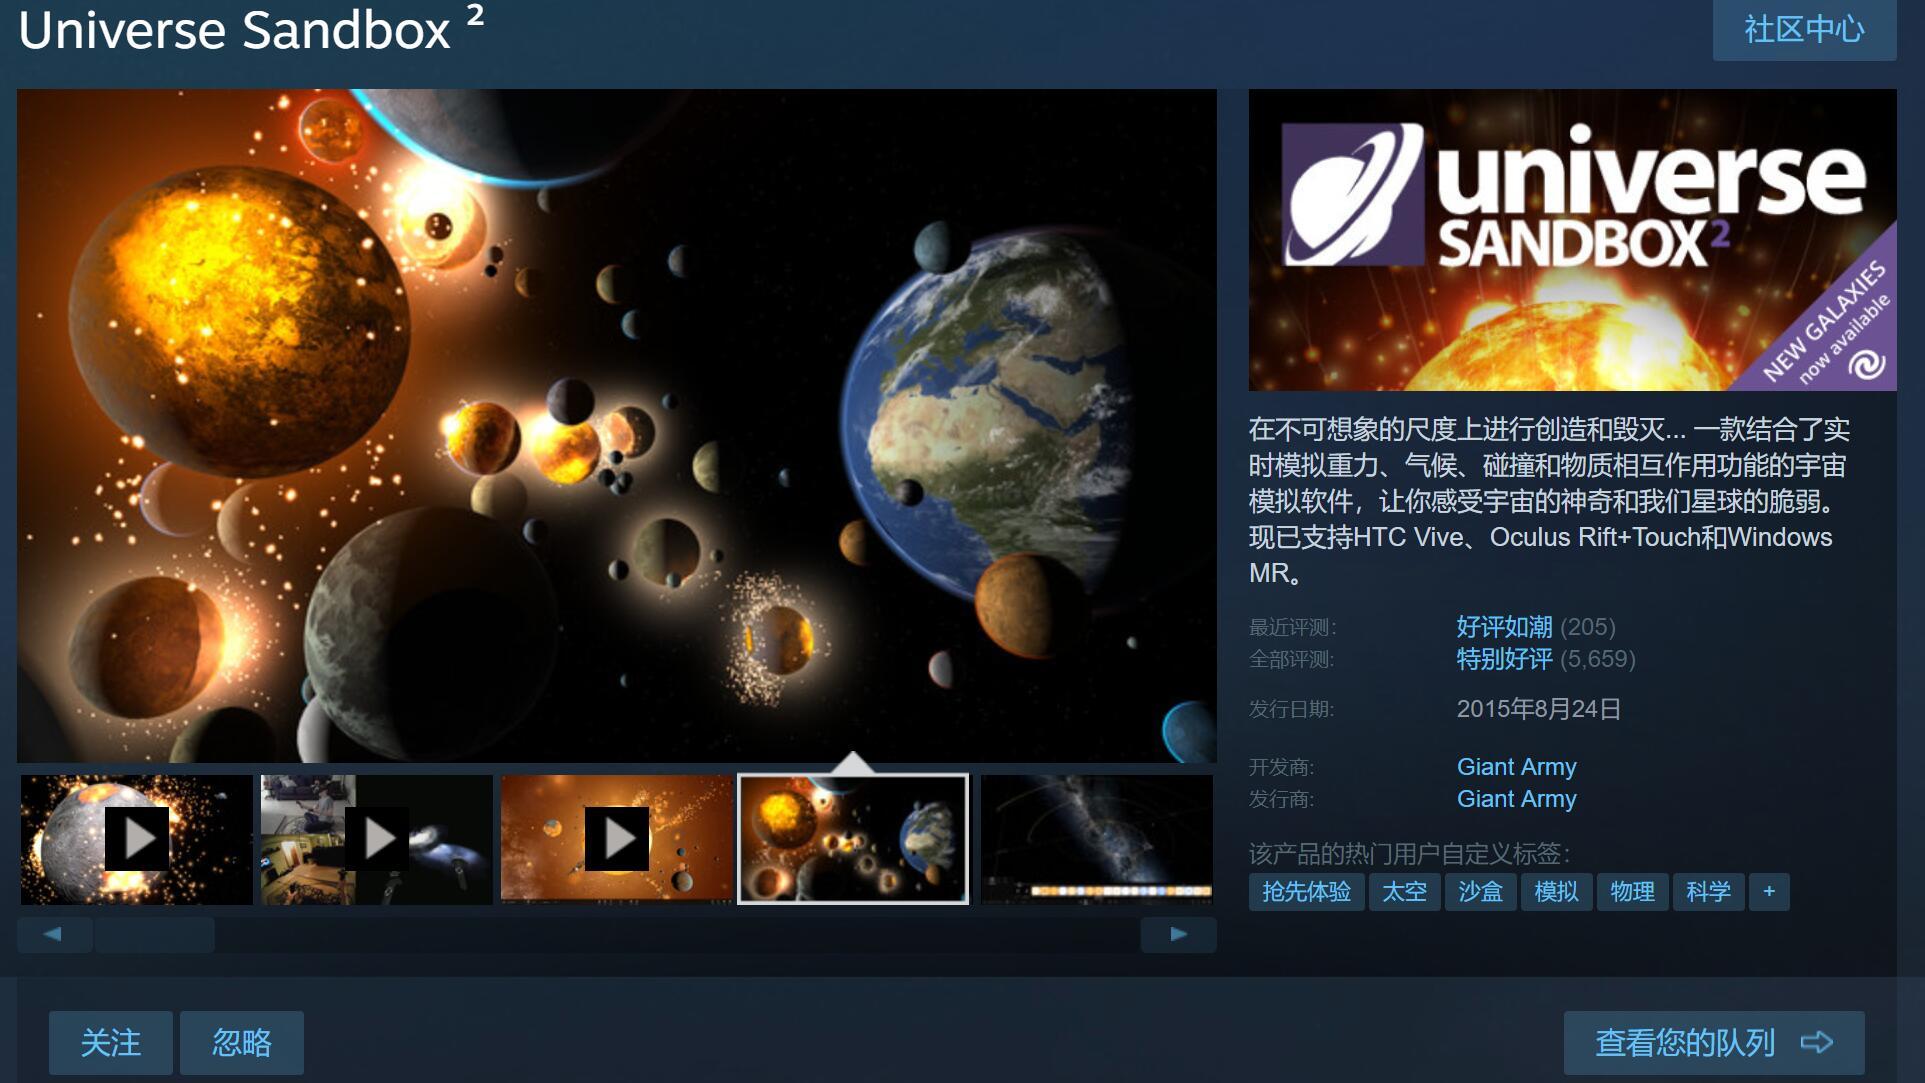 chinapornchatroomonline_vr中在线人数最多的vr社交游戏,vrchat支持全身追踪(当然里面全是